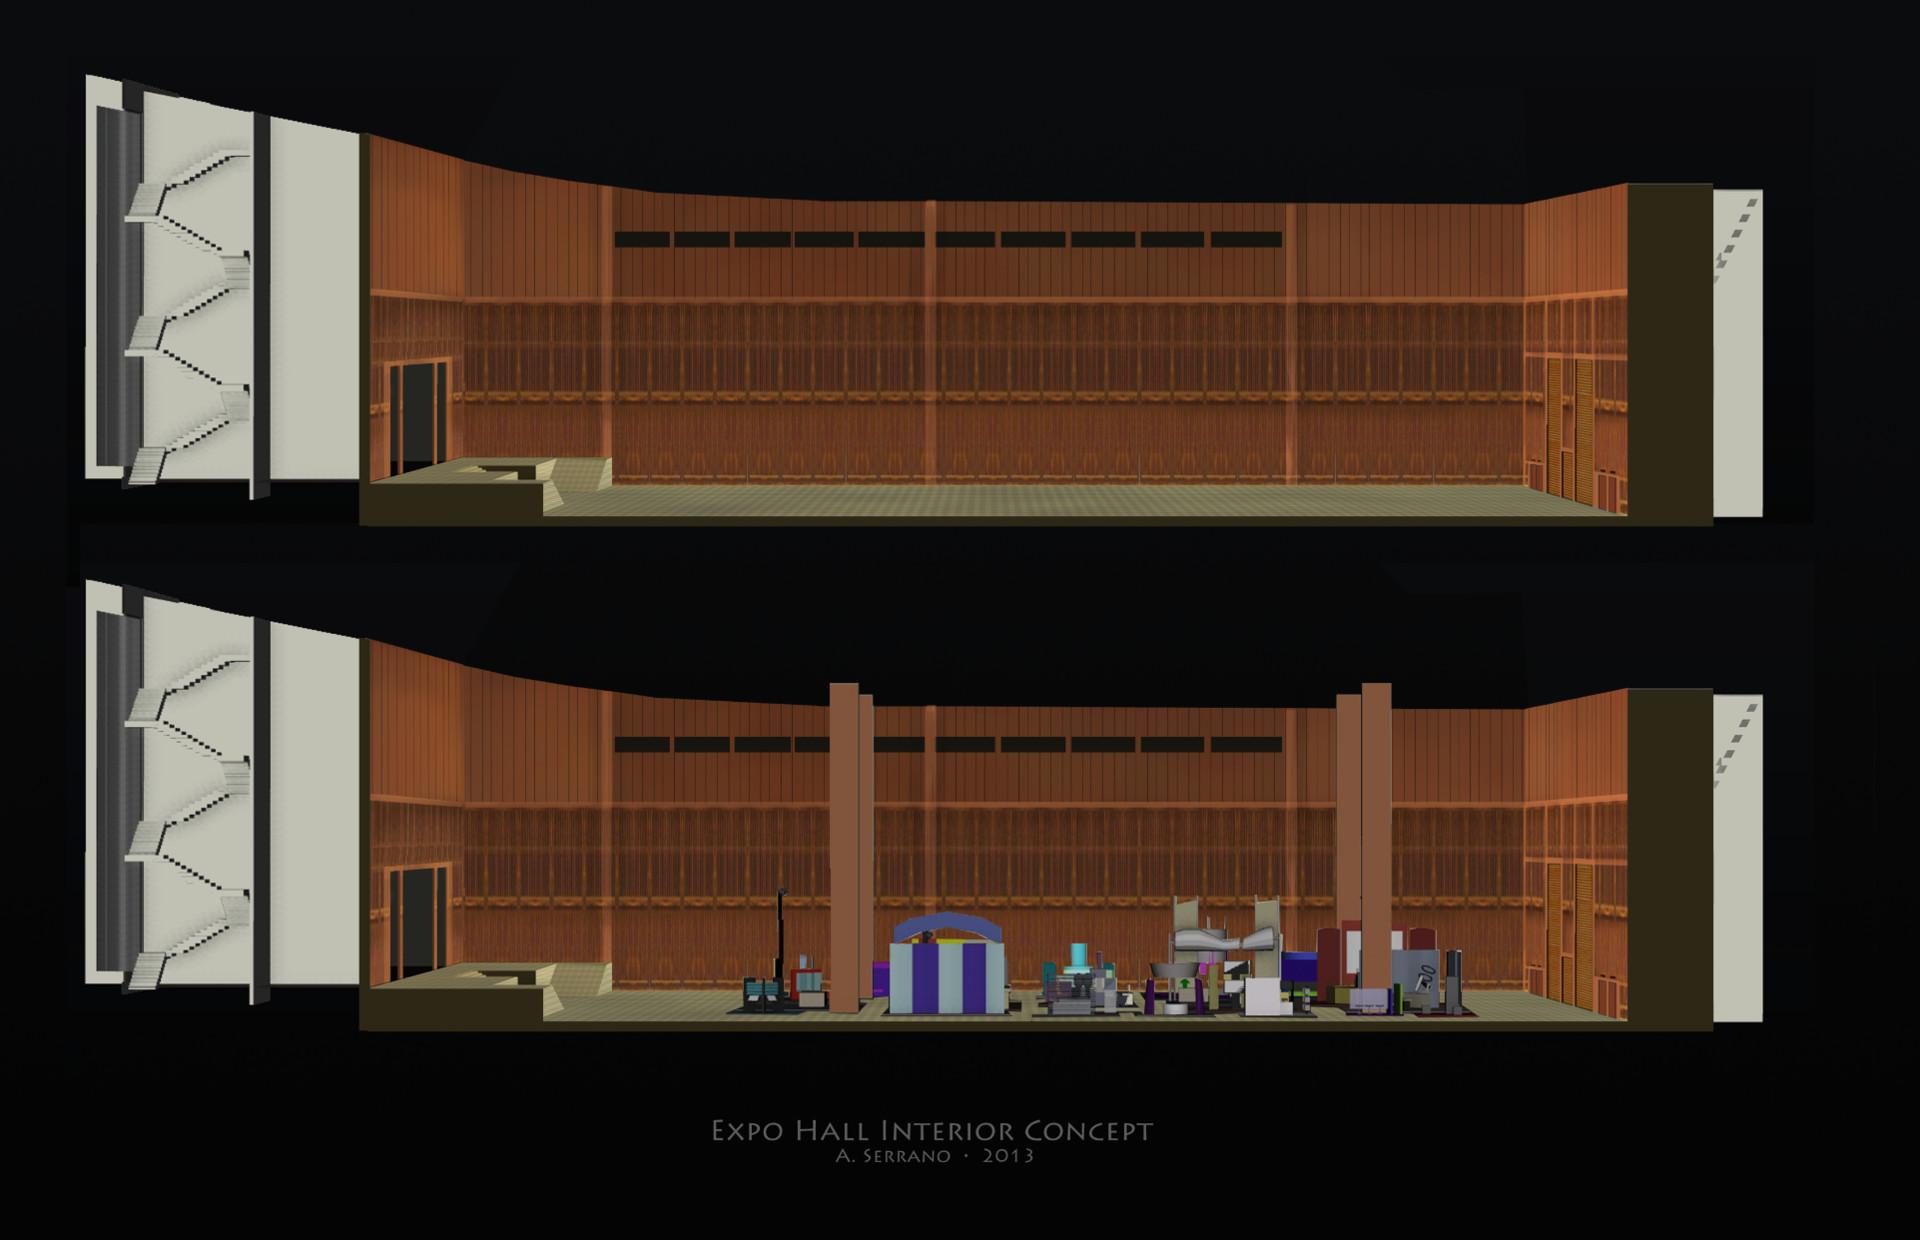 Interior concept 3